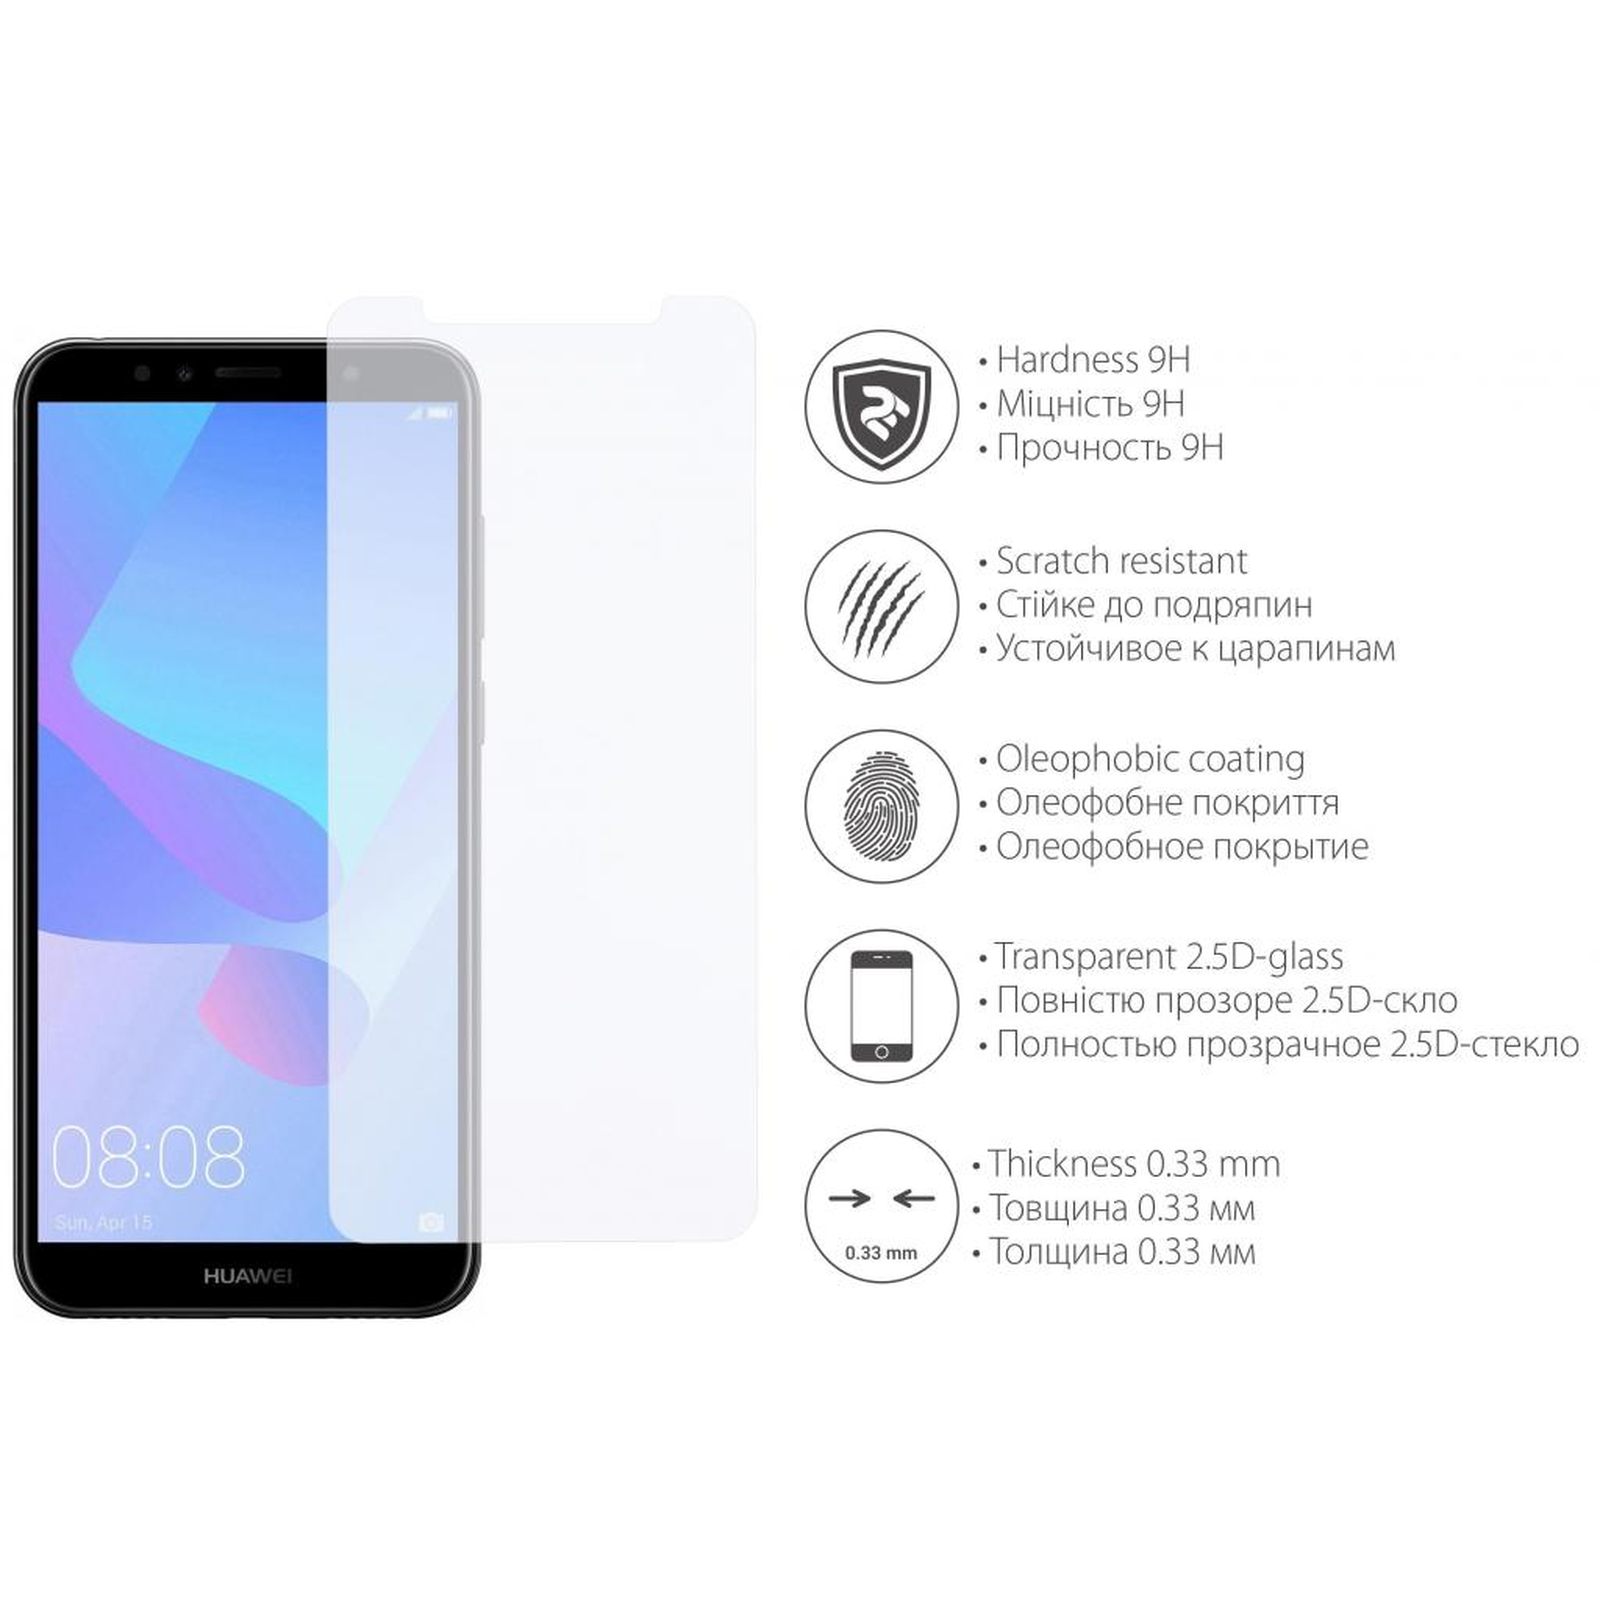 Стекло защитное 2E для Huawei Y6 2018 2.5D Clear (2E-TGHW-Y618-25D) изображение 3